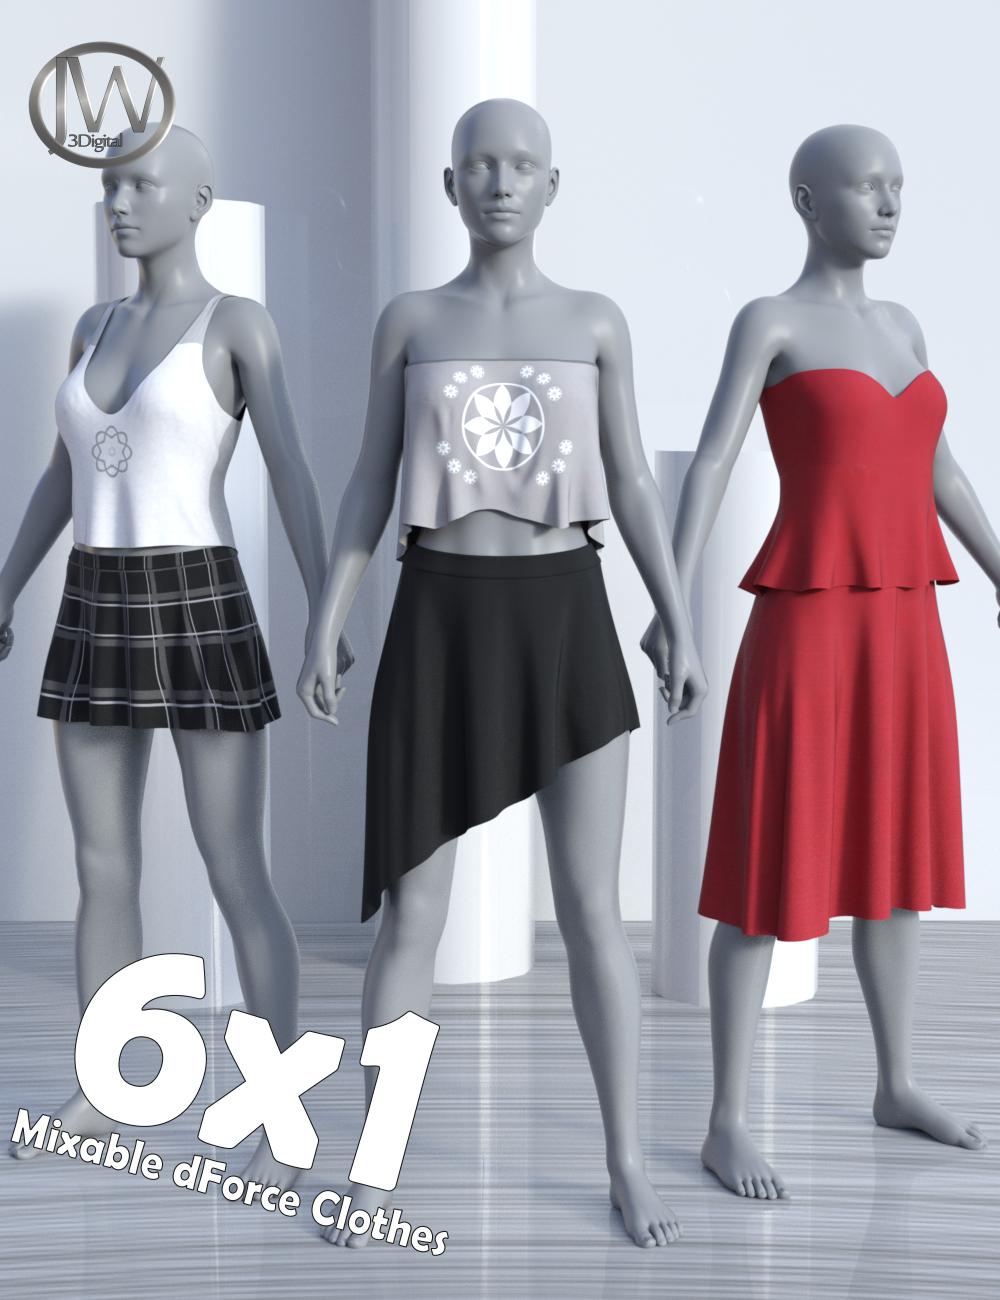 dForce JW Clothes Pack for Genesis 8 Female(s) by: JWolf, 3D Models by Daz 3D